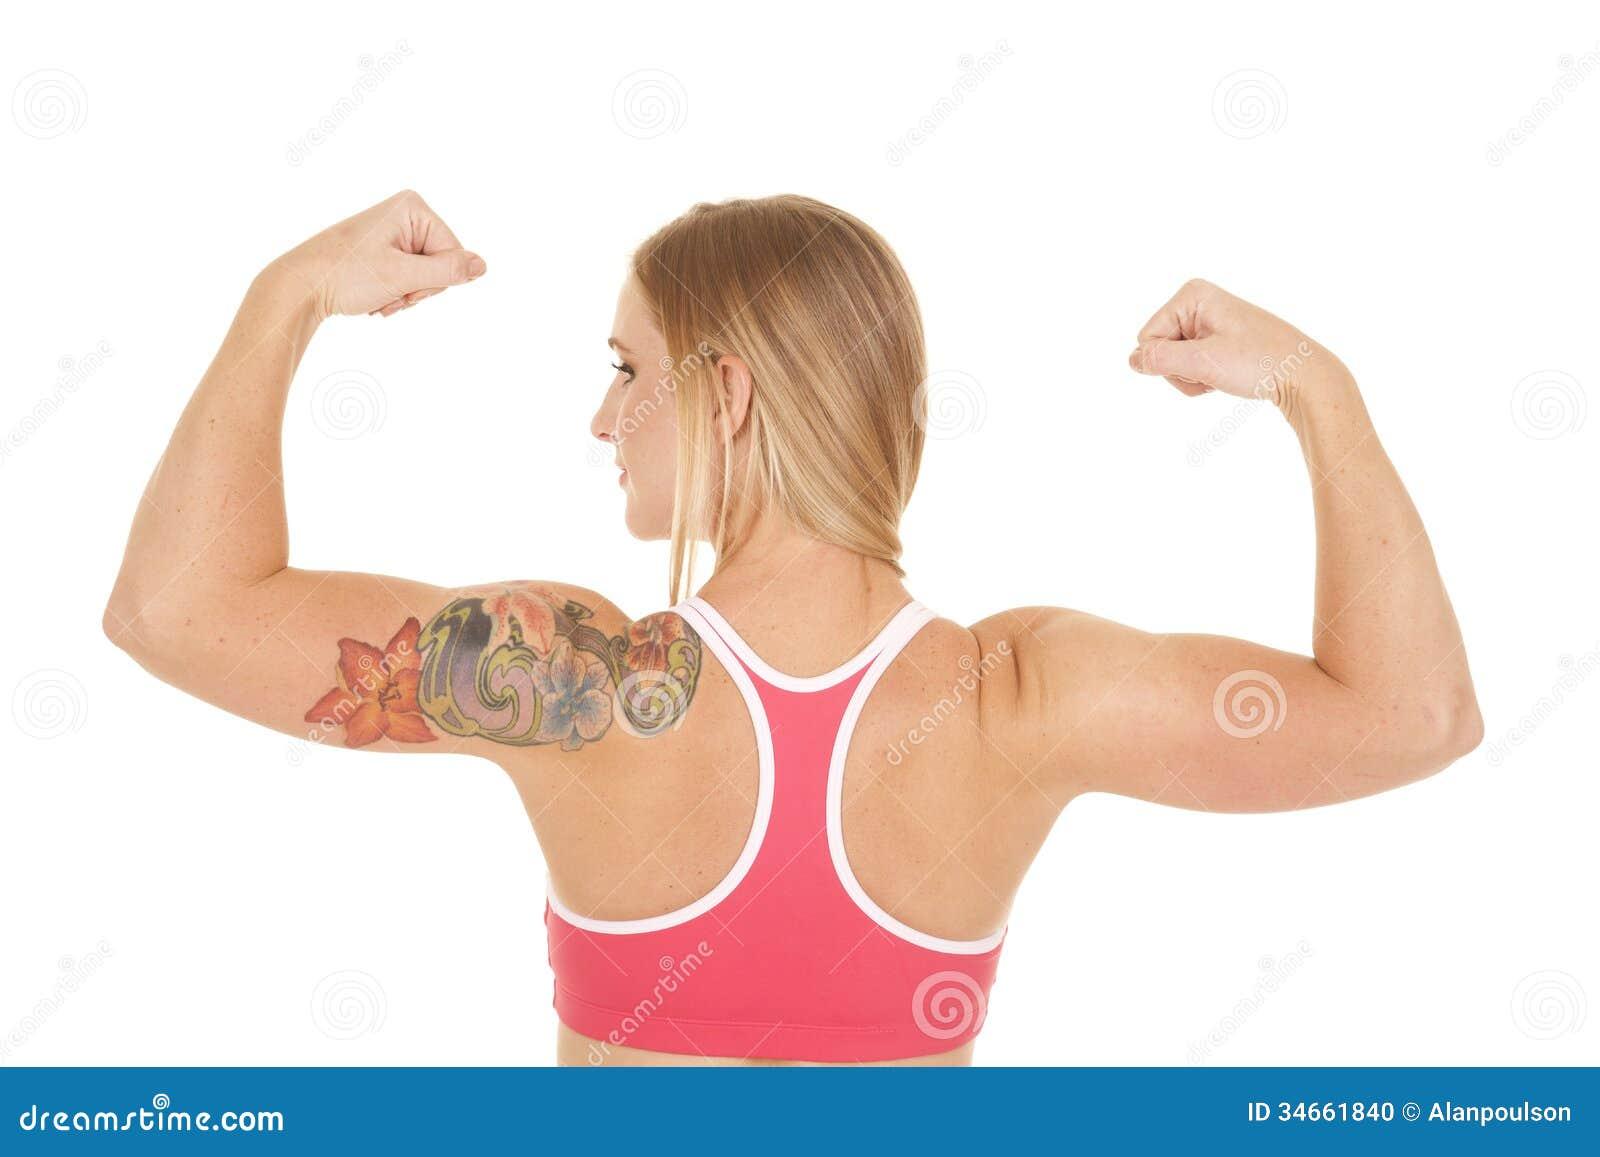 who are more active black femalkes or white females pdf